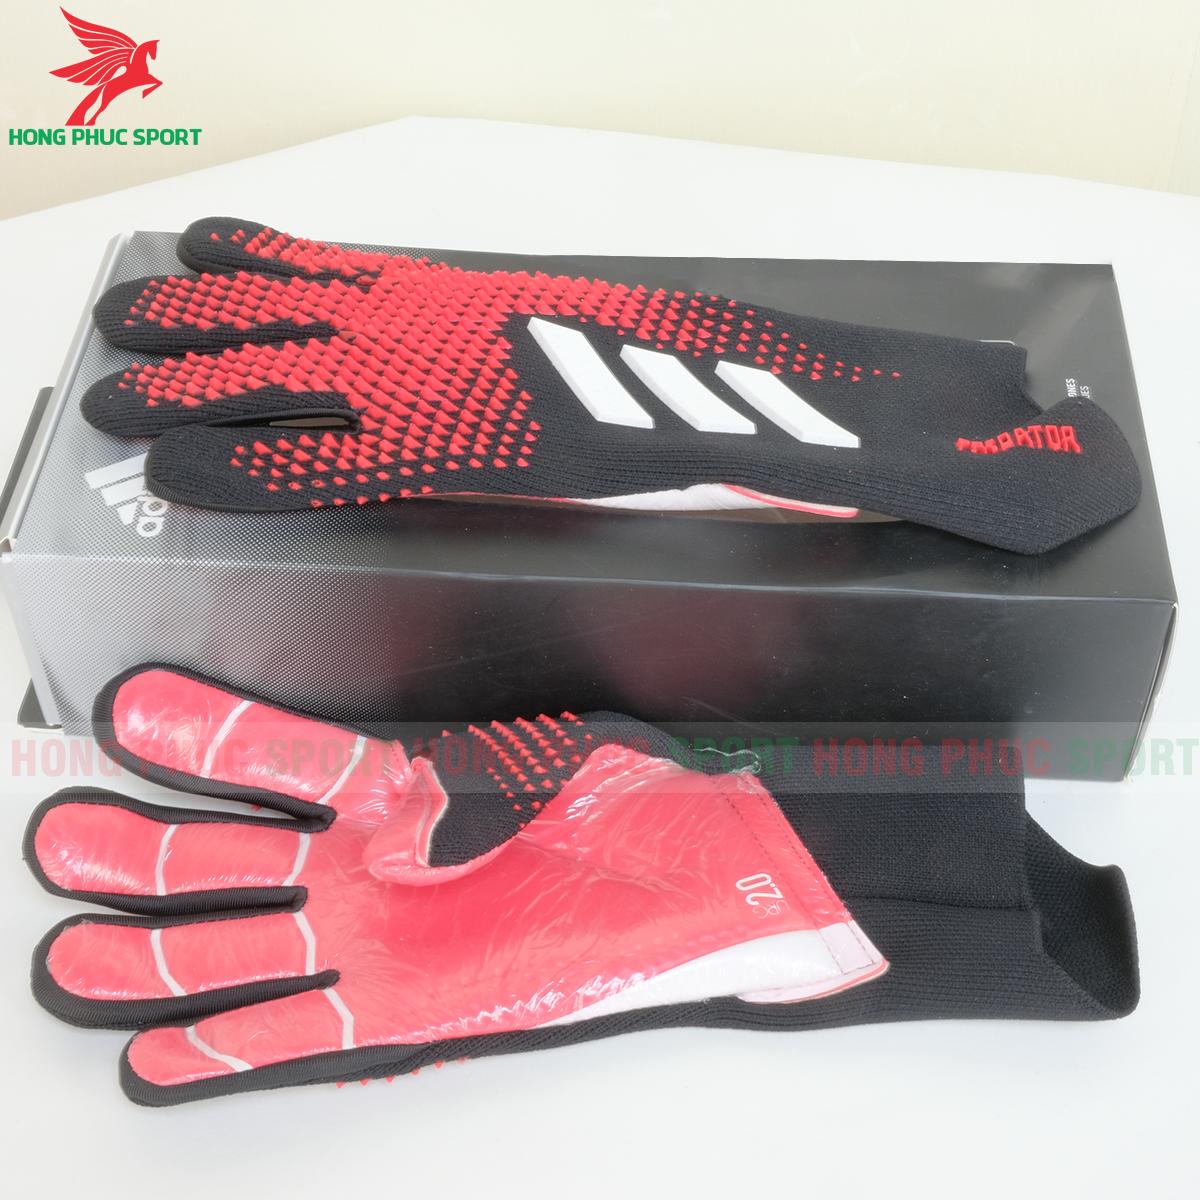 https://cdn.hongphucsport.com/unsafe/s4.shopbay.vn/files/285/gang-tay-thu-mon-adidas-predator-gl-mutator-urg-20-mau-3-4-5f7c4665f343e.png